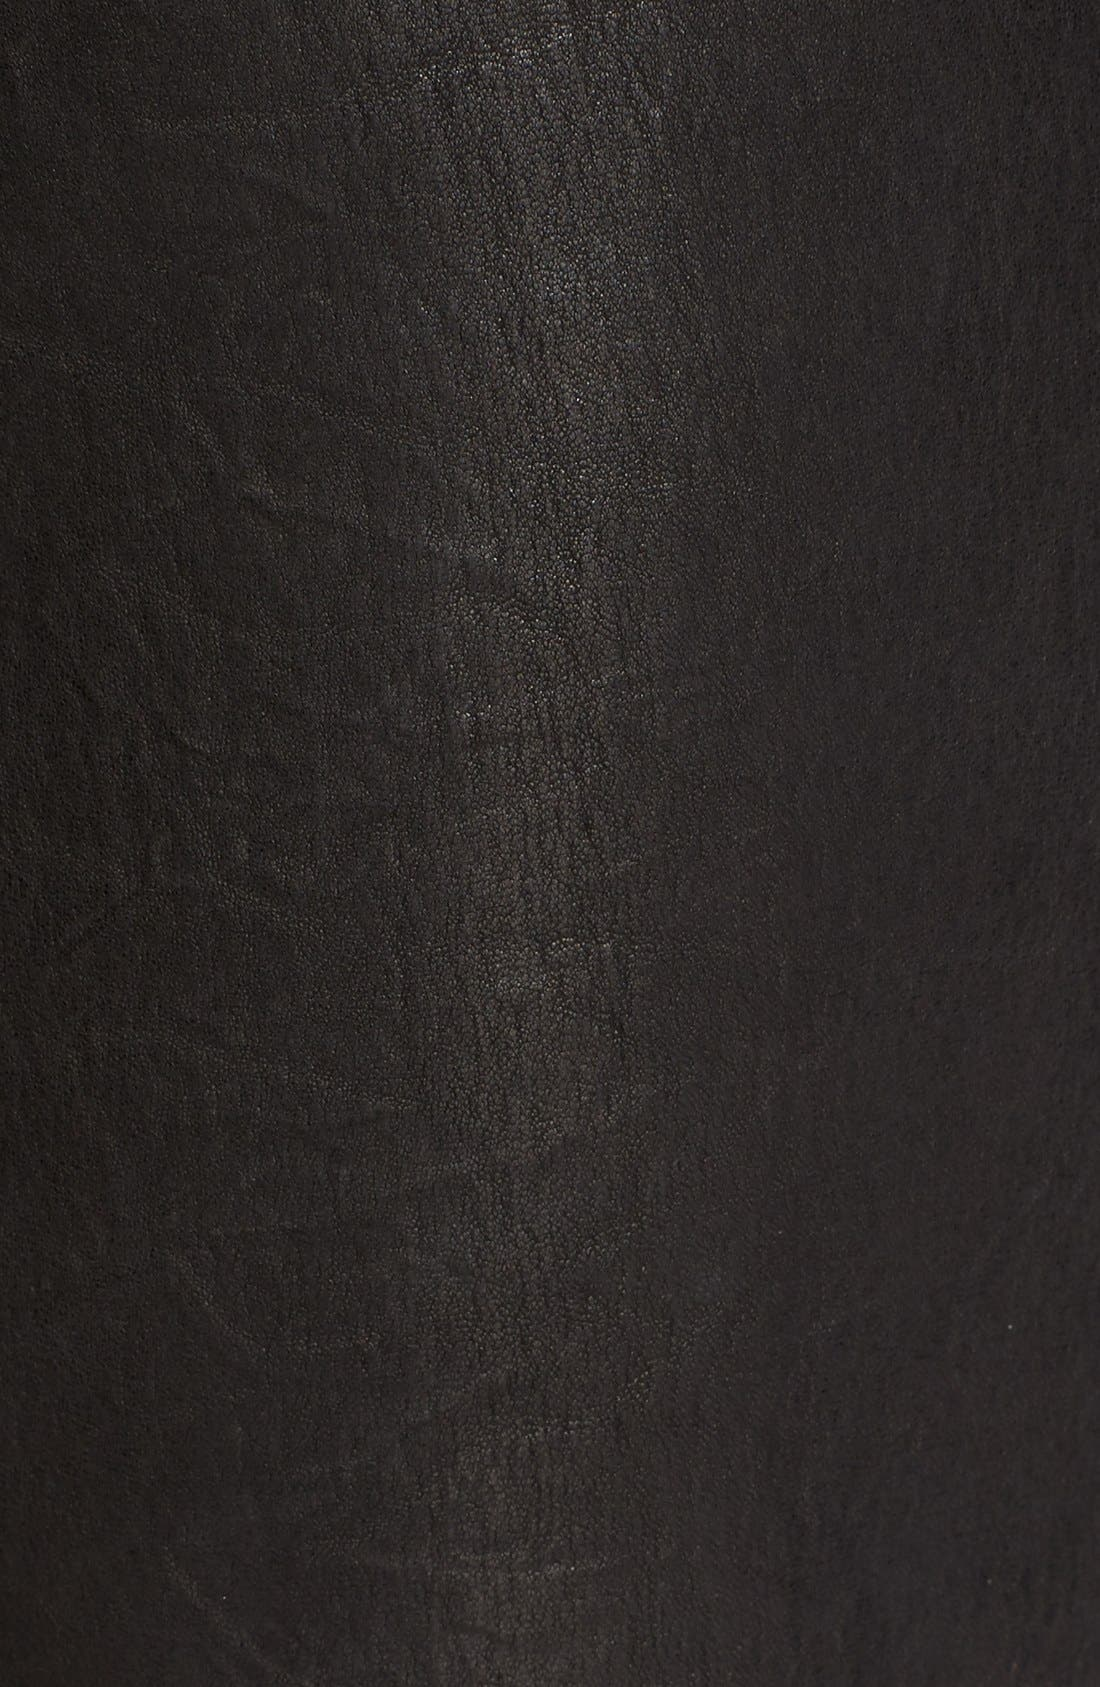 'Le Skinny' Lambskin Leather Pants,                             Alternate thumbnail 6, color,                             WASHED BLACK